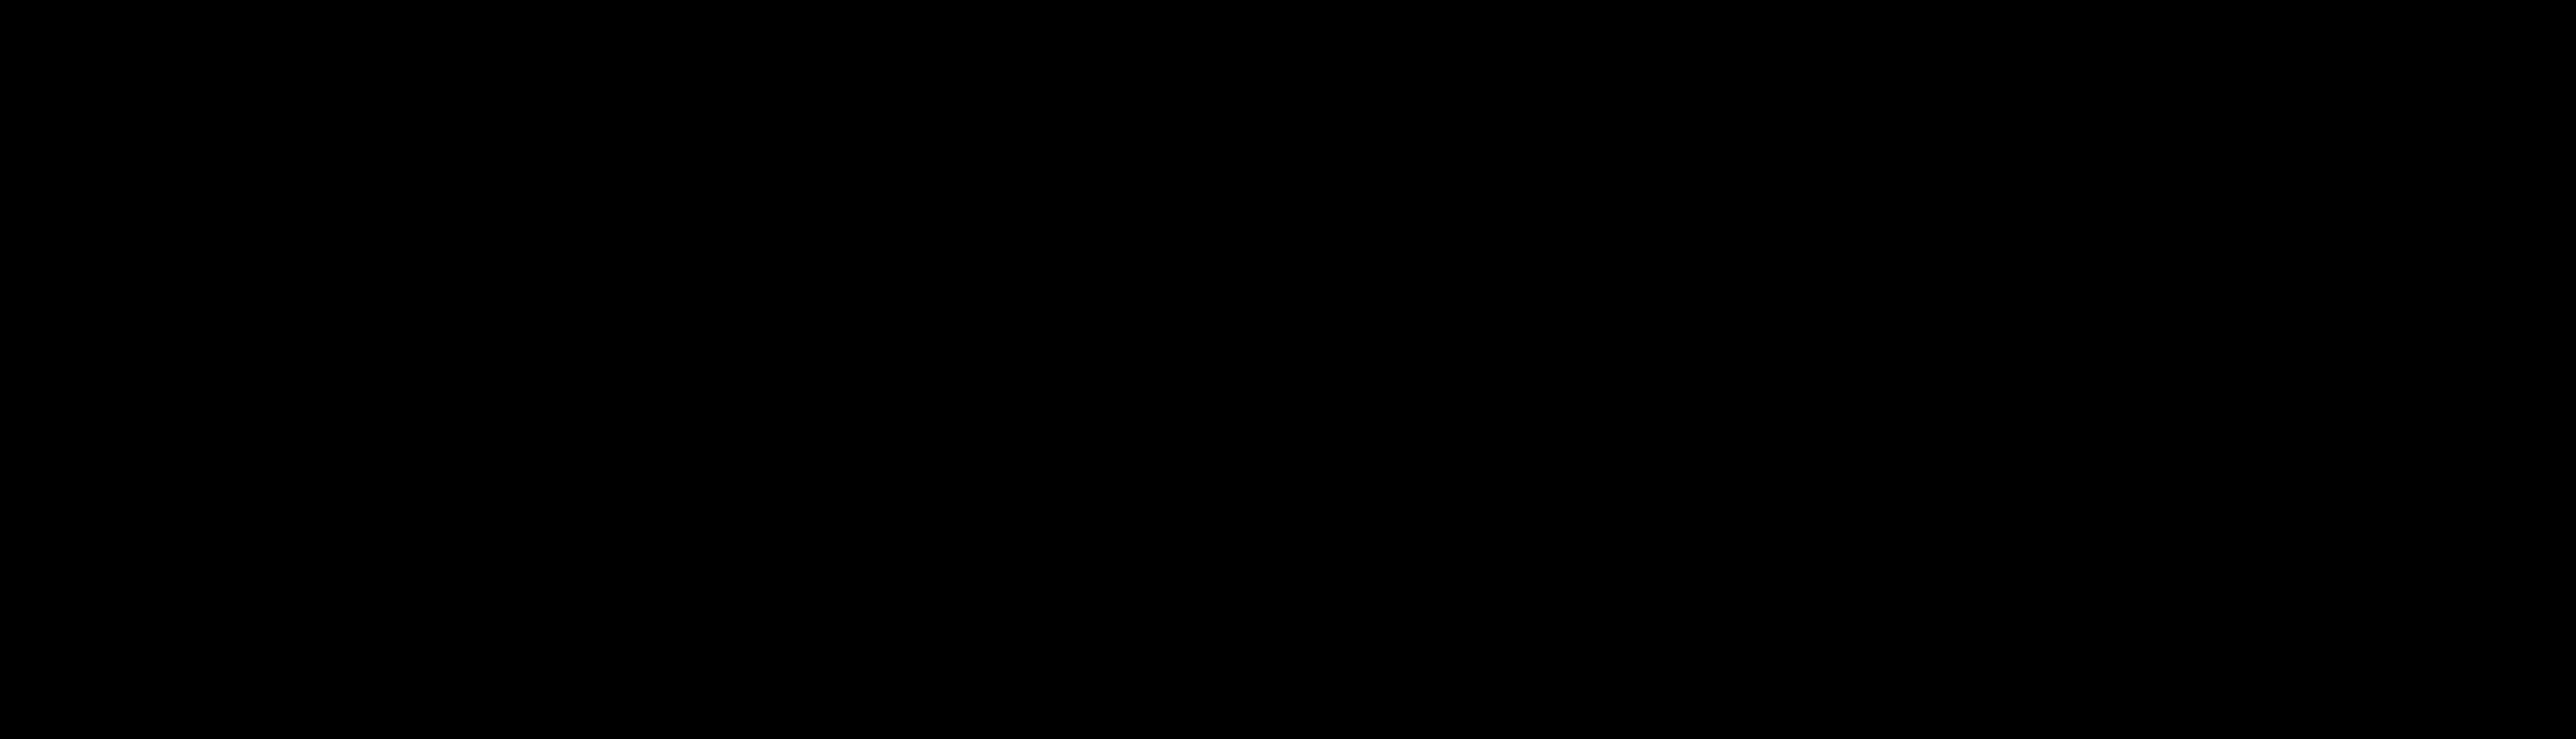 Dune brand logo